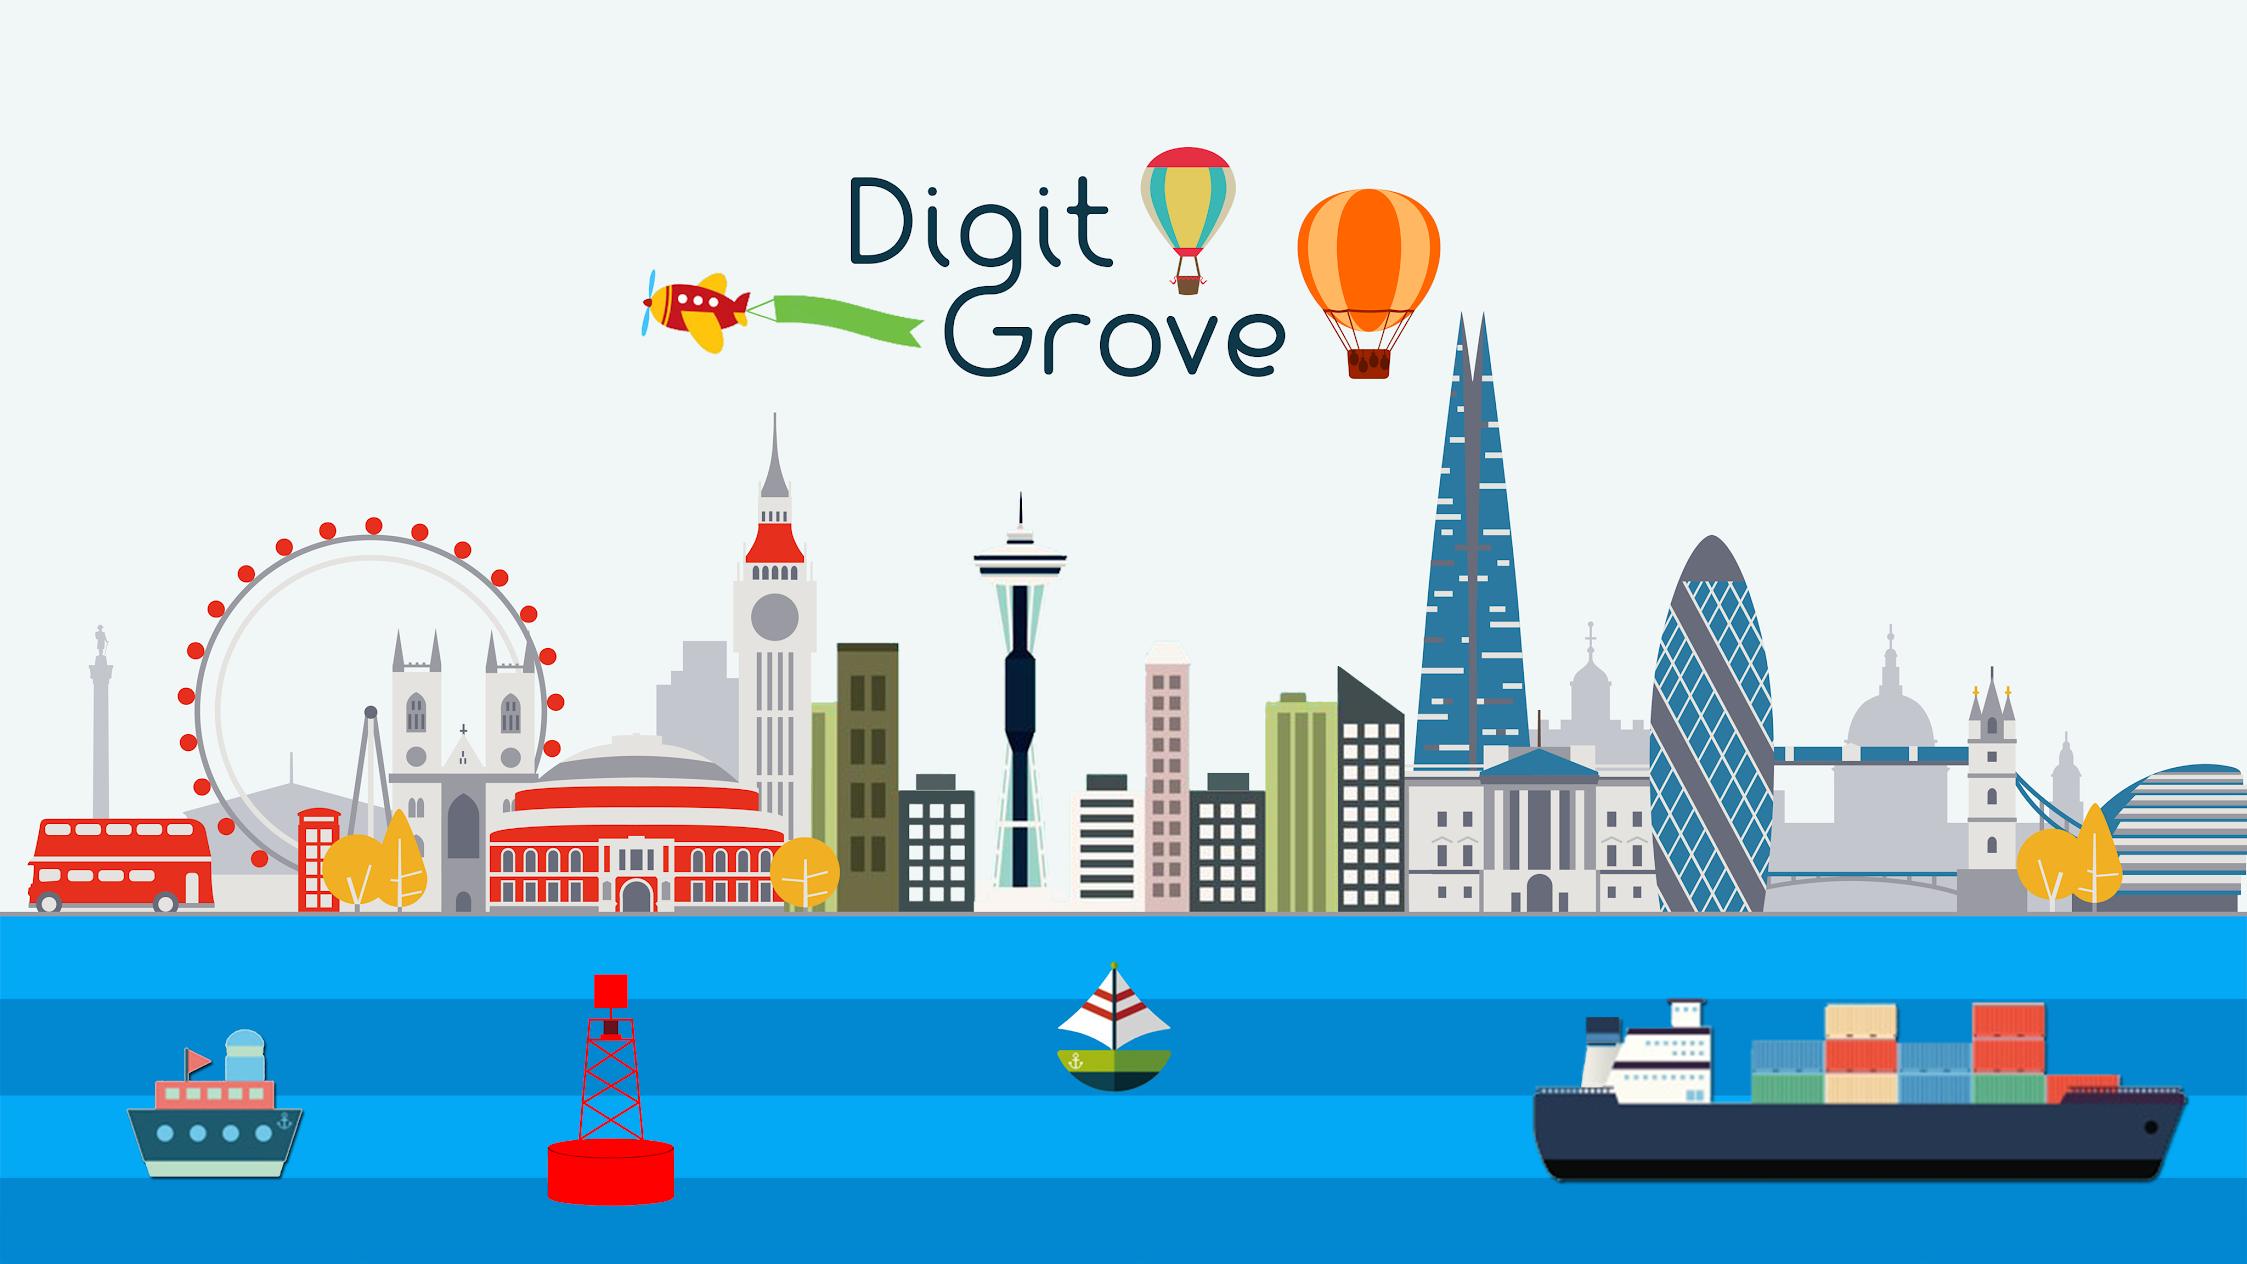 Digit Grove